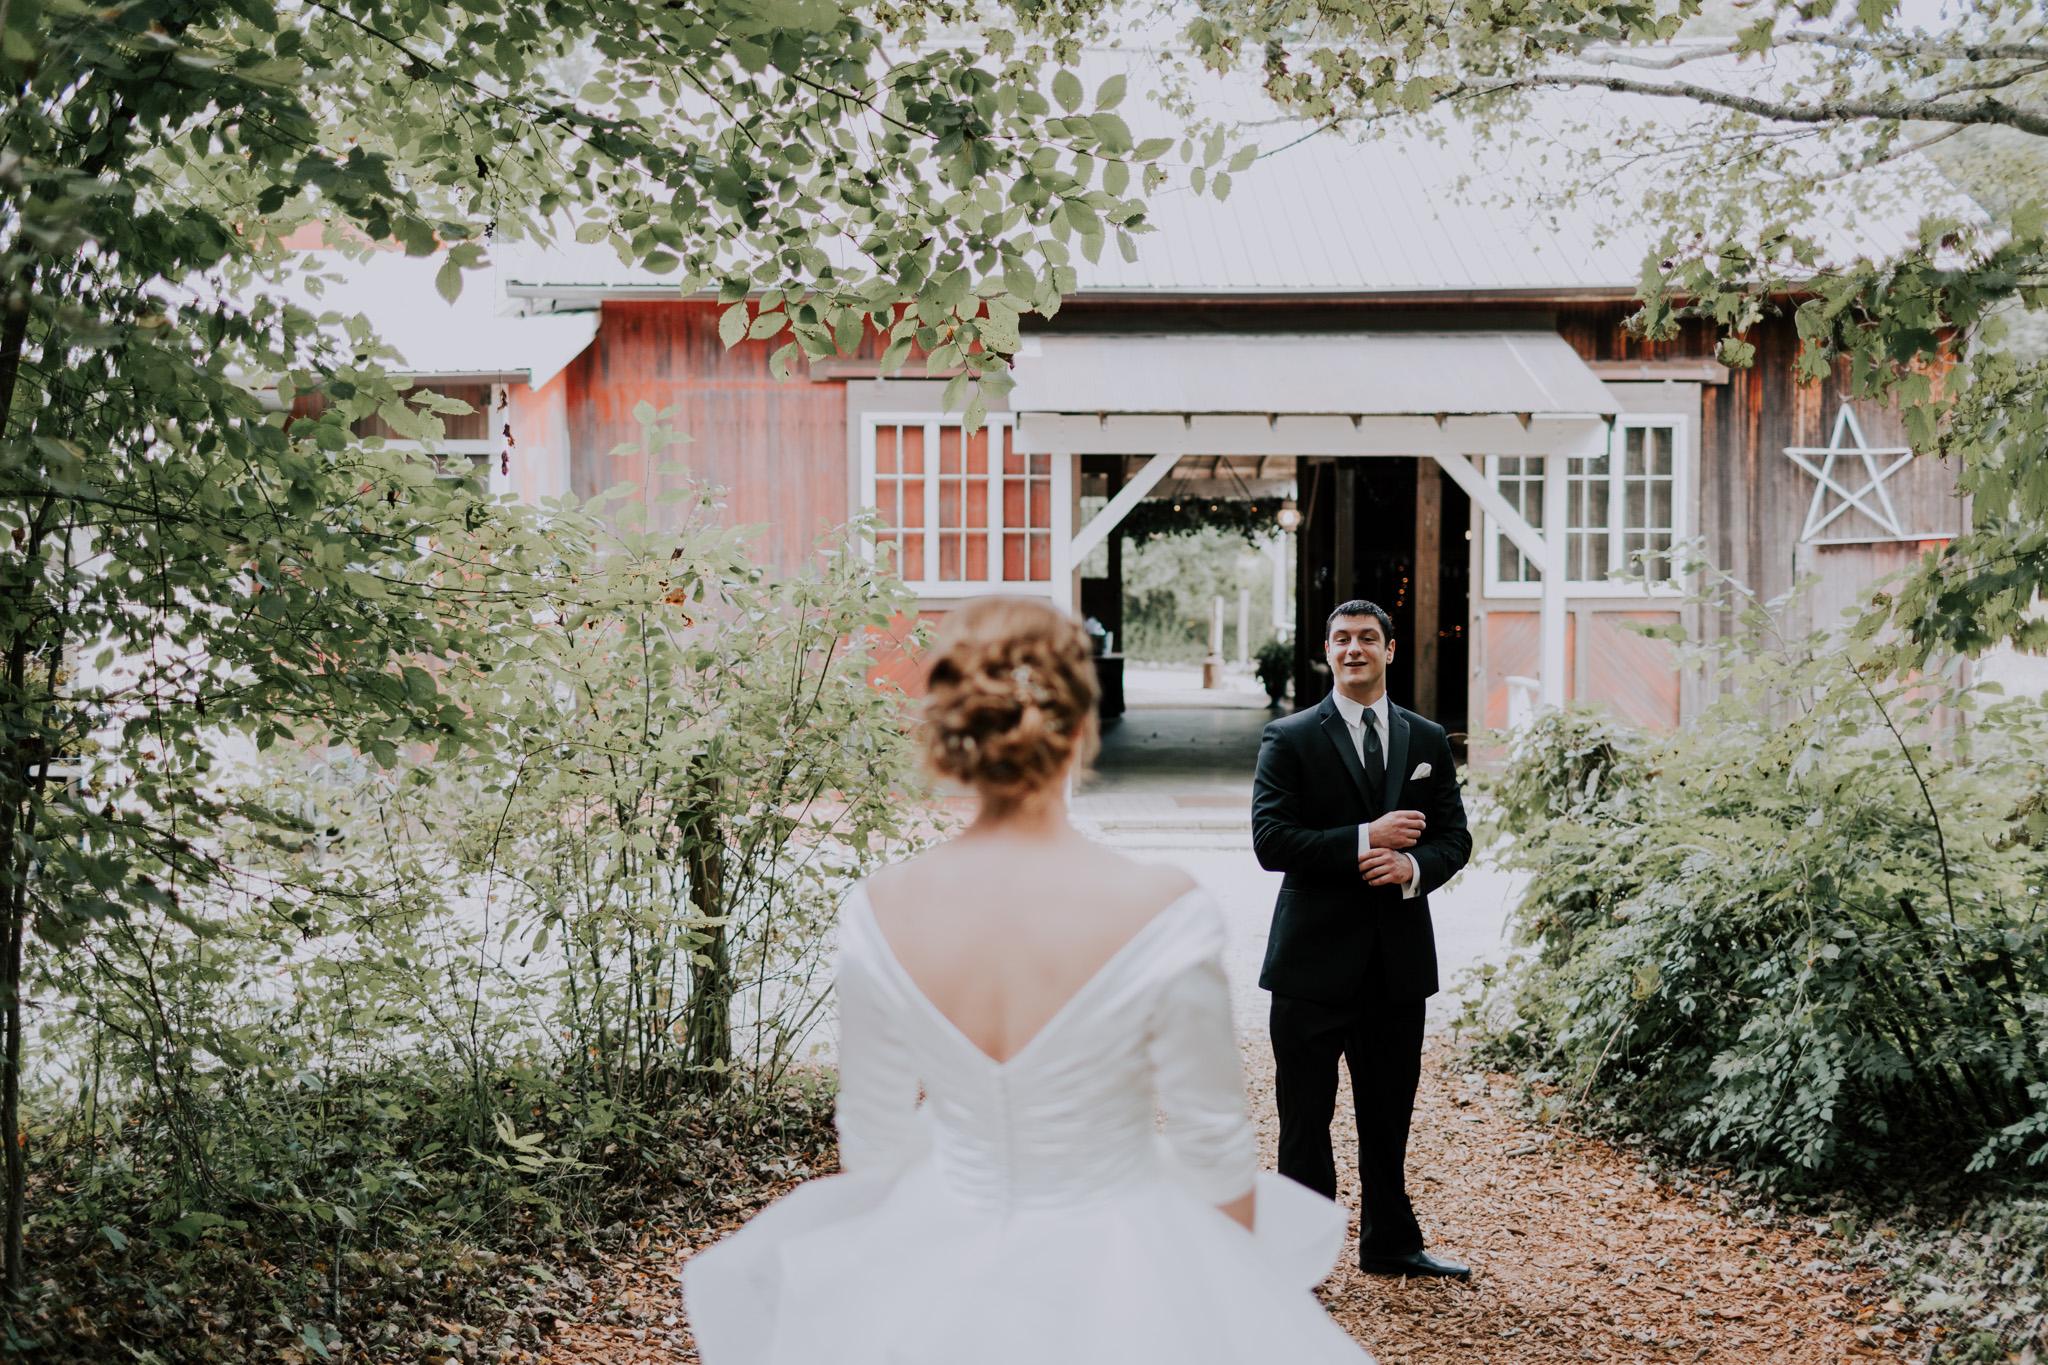 MillCreek-Wilde-Wedding-Barn-Michigan-Eliza-Eric-Vafa-Photo289.jpg